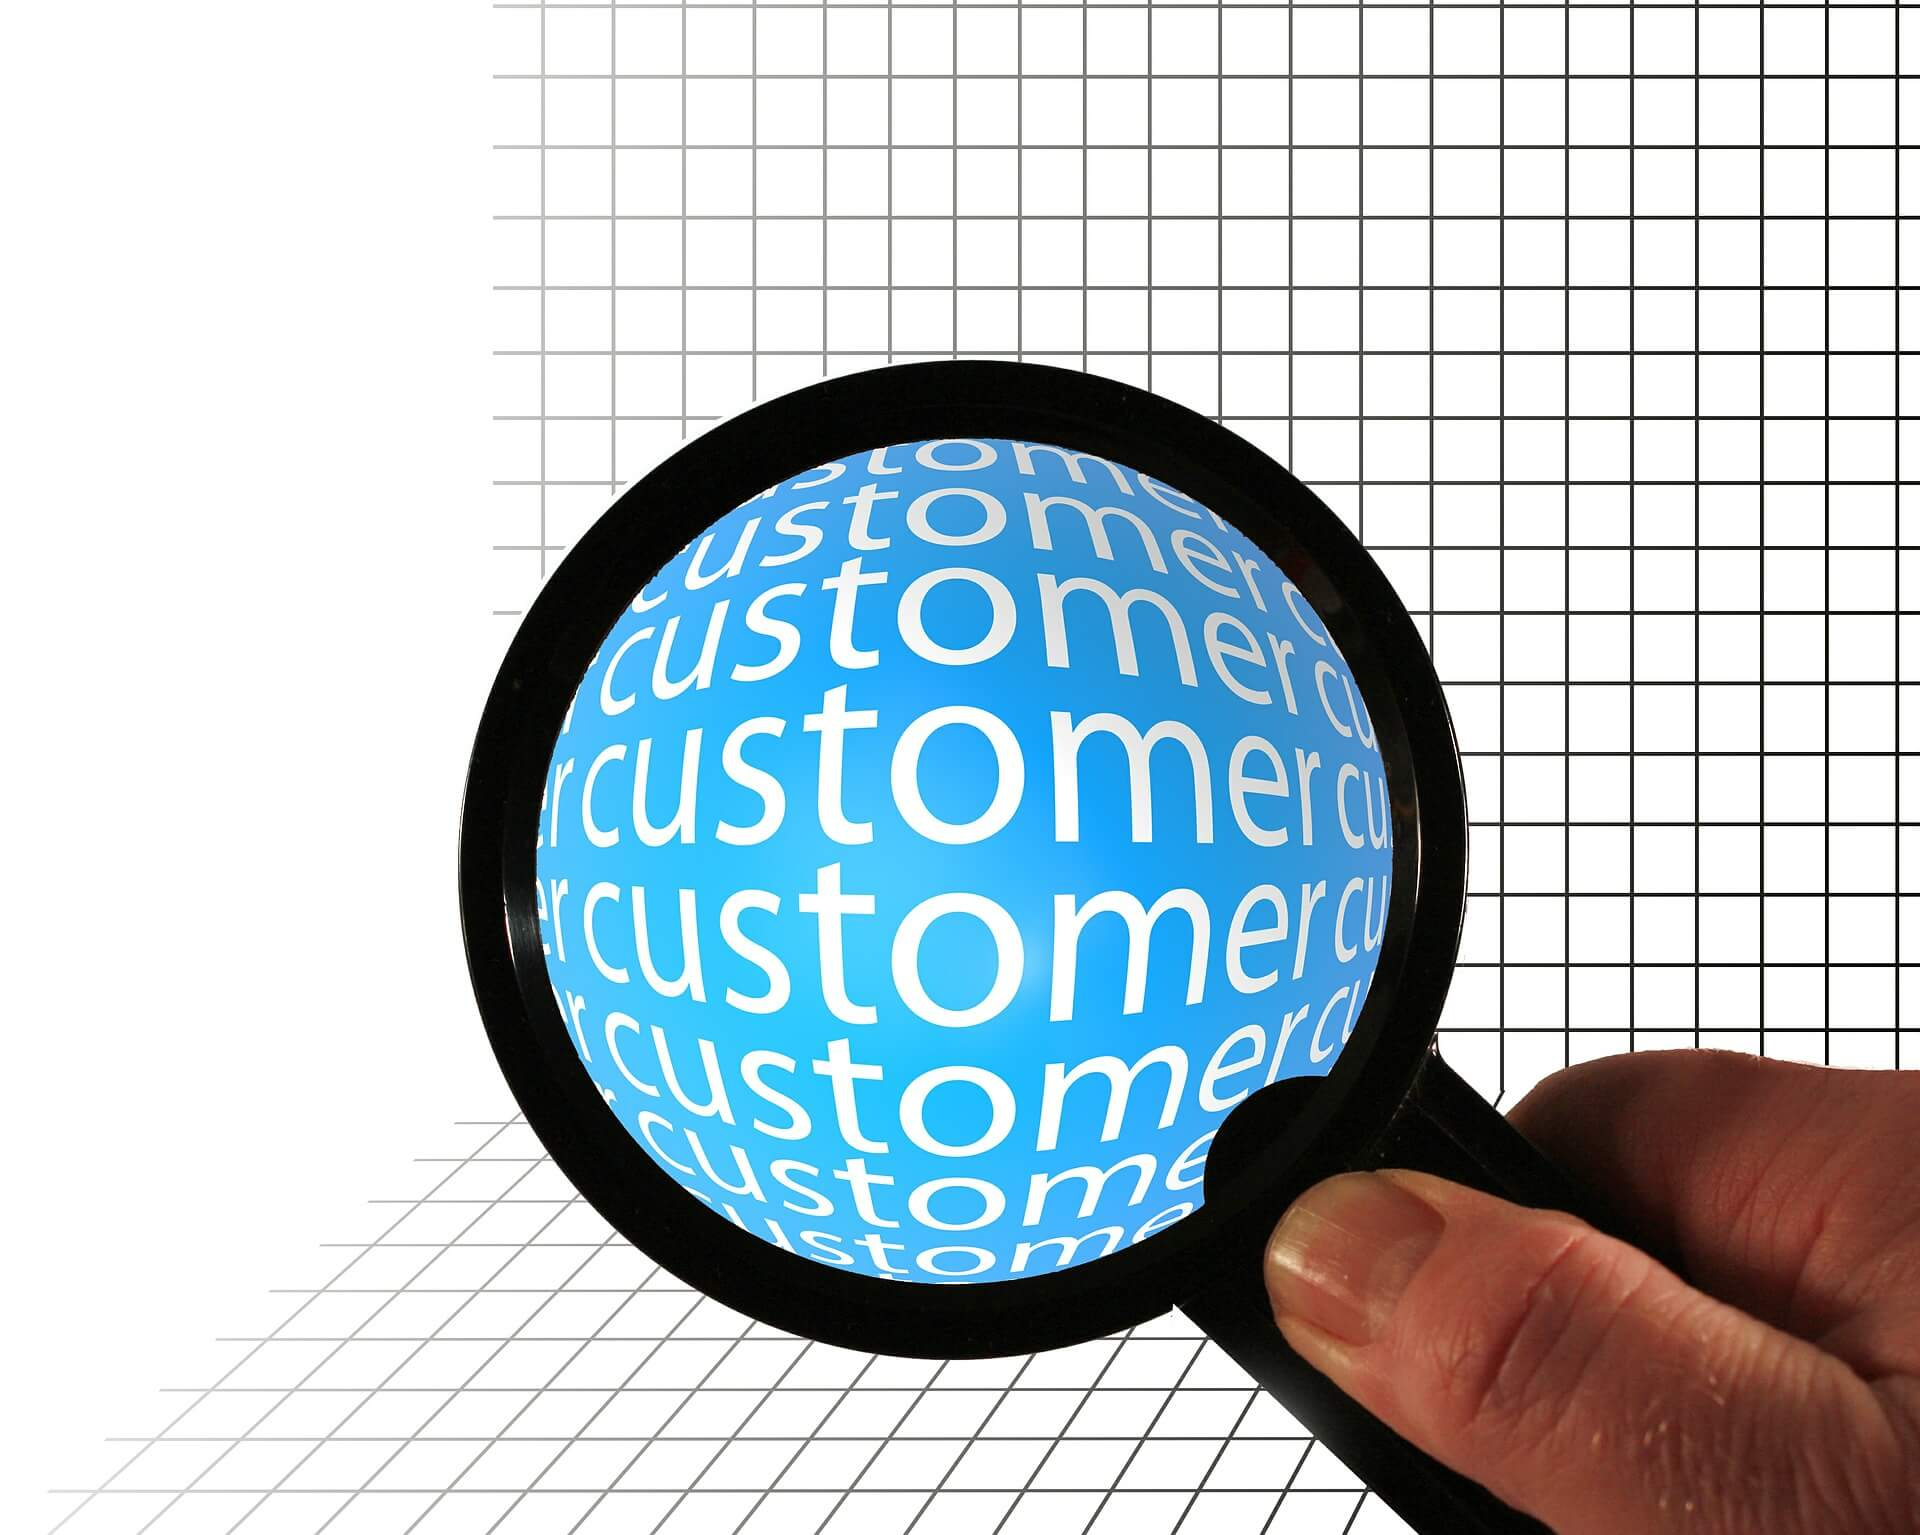 Leverage Customers